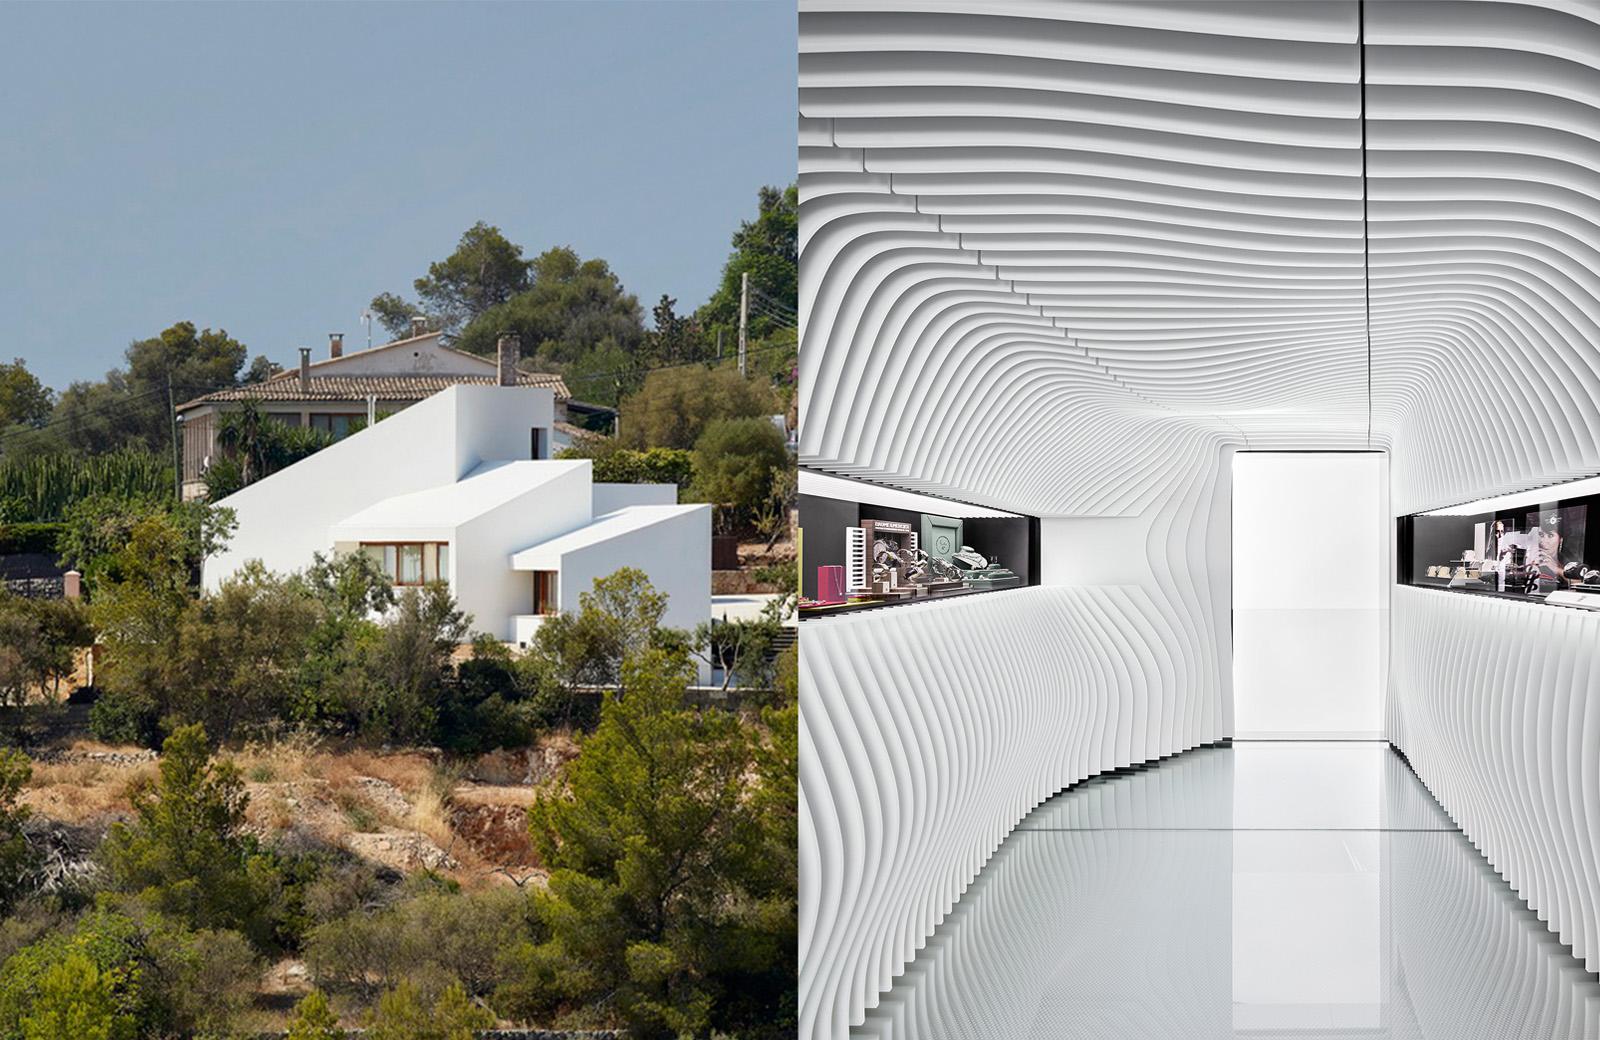 oda-2017_plataforma-arquitectura_casamm_oficinasra